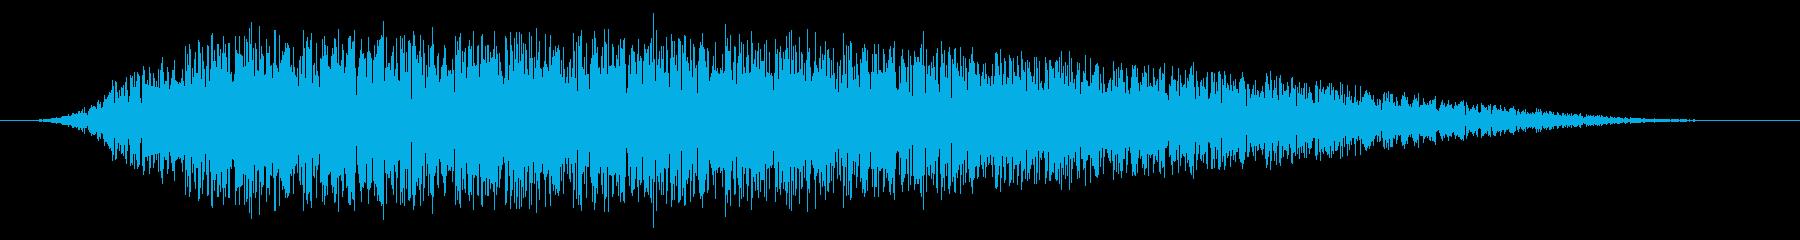 SNES 野球01-09(歓声)の再生済みの波形